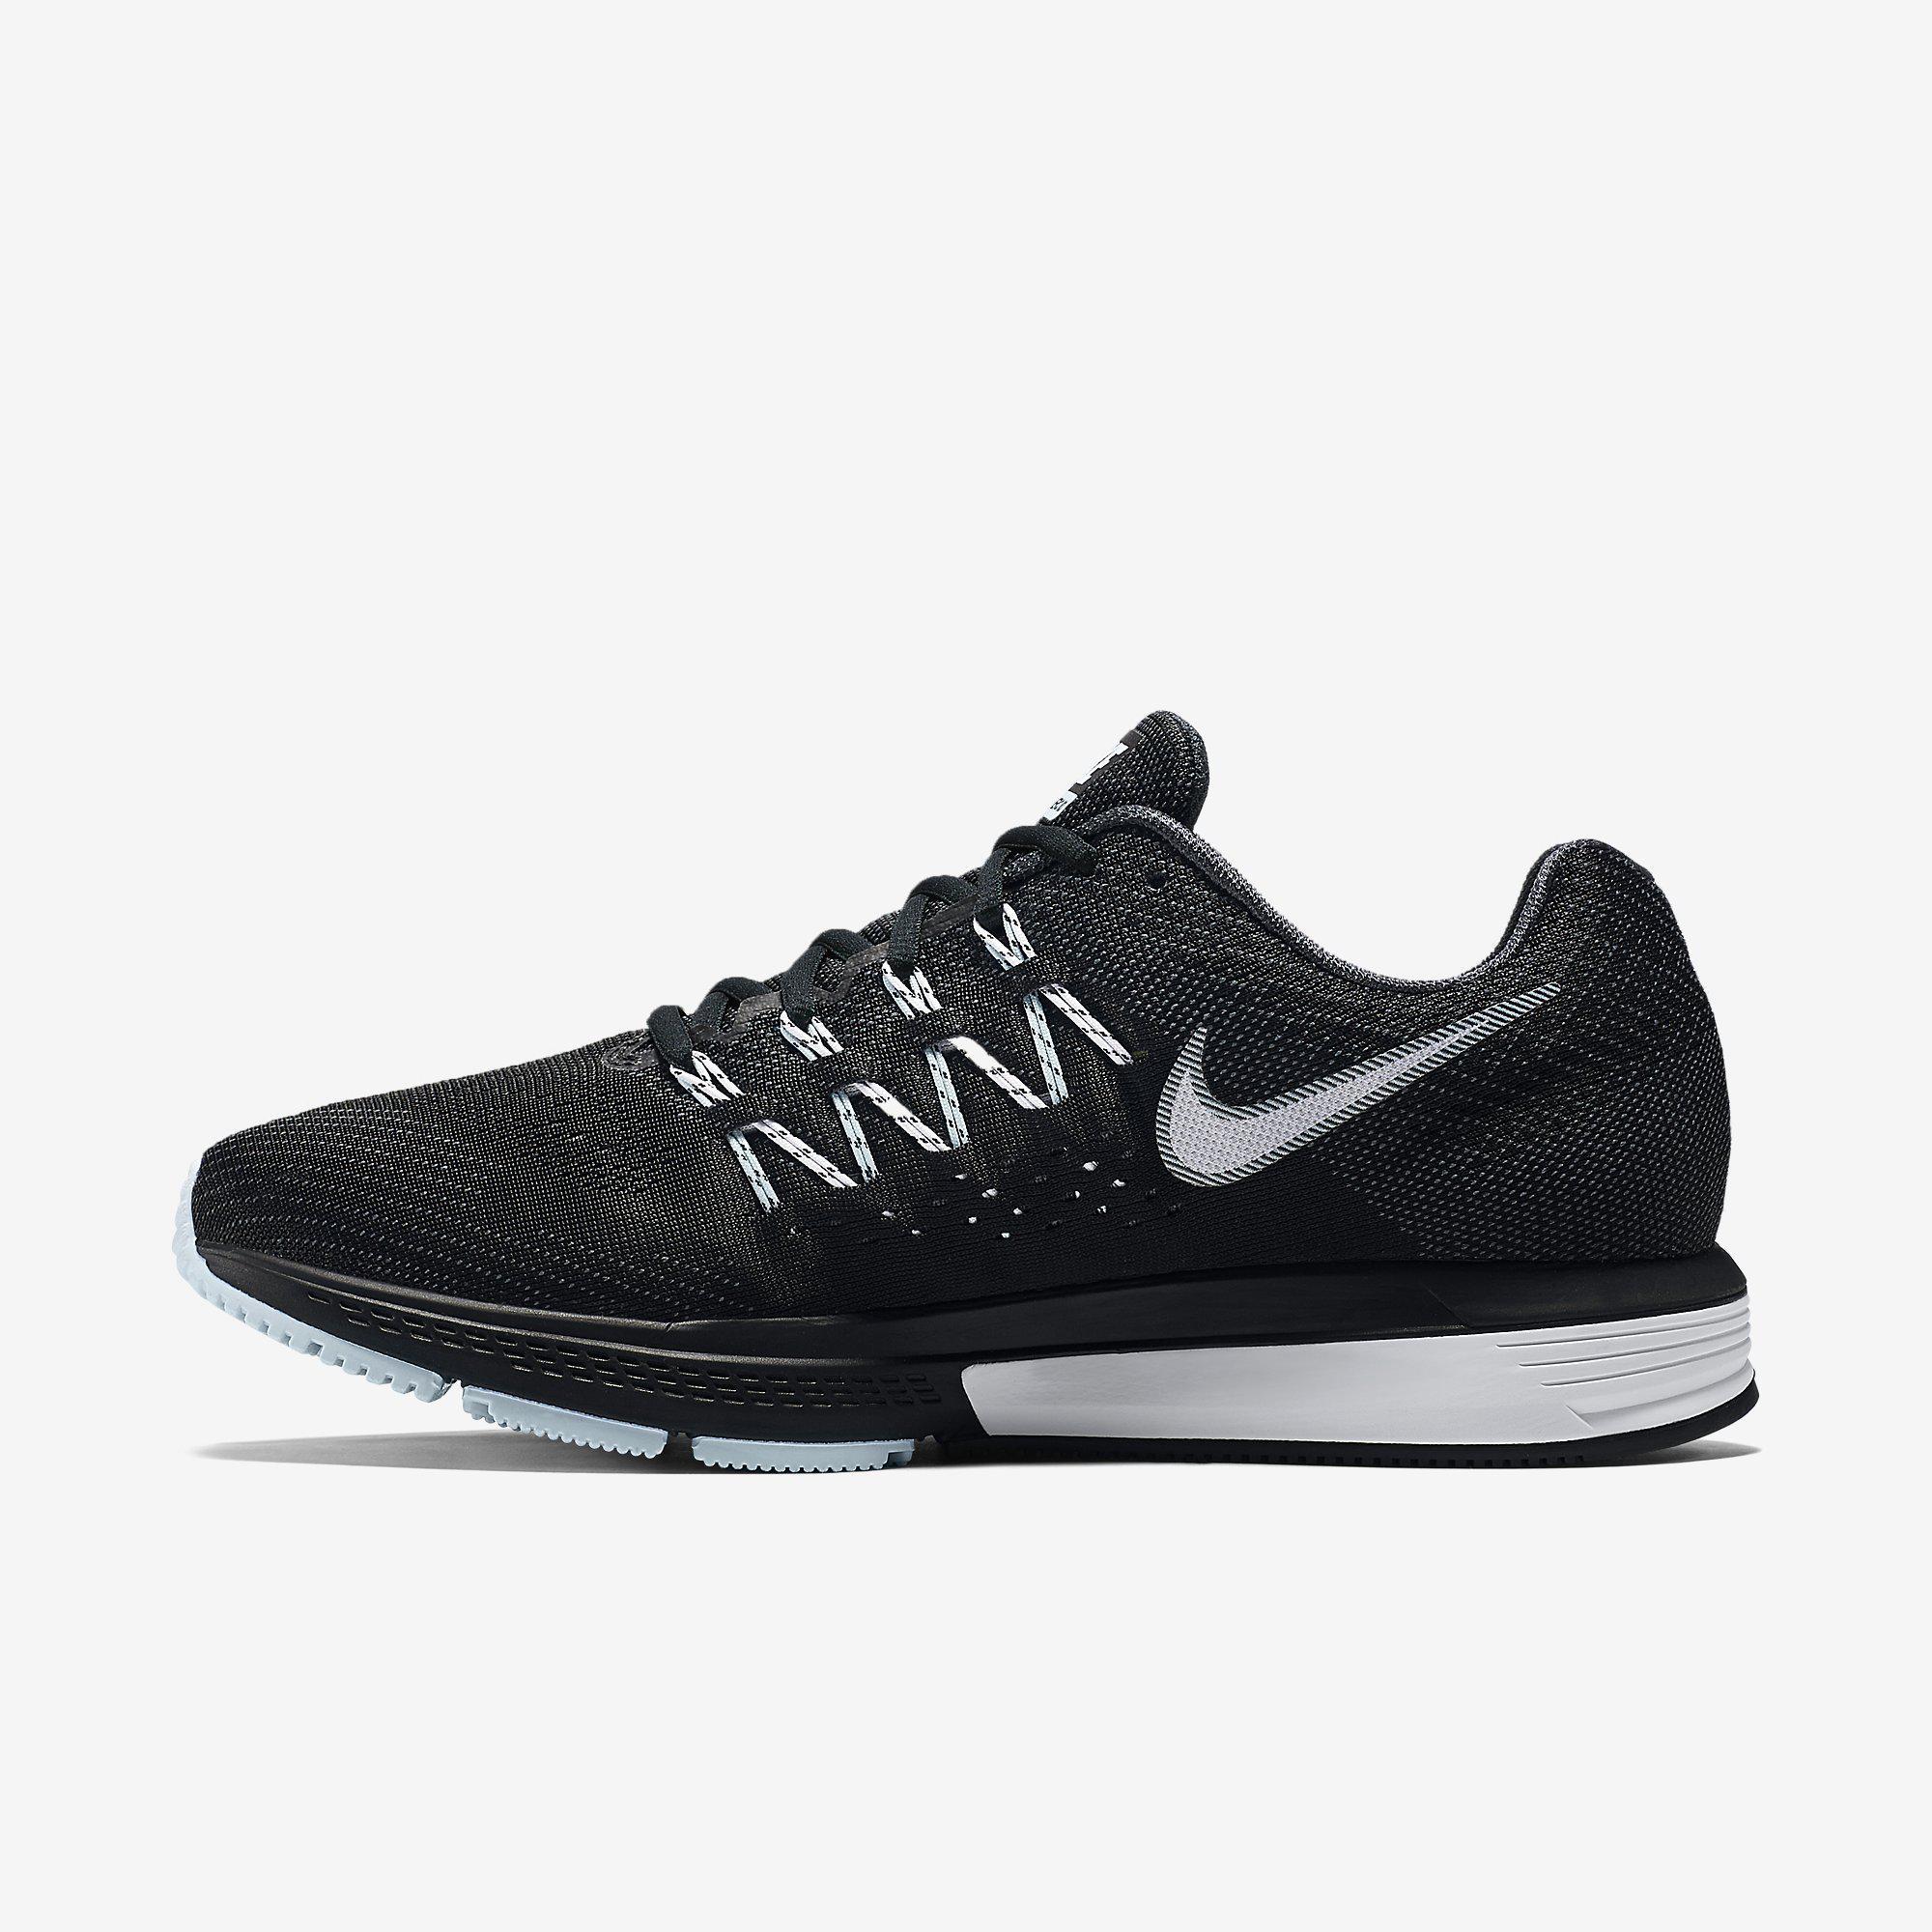 buy online fd93f b9f0d Nike Mens Air Zoom Vomero 10 Running Shoes - CharcoalBlack